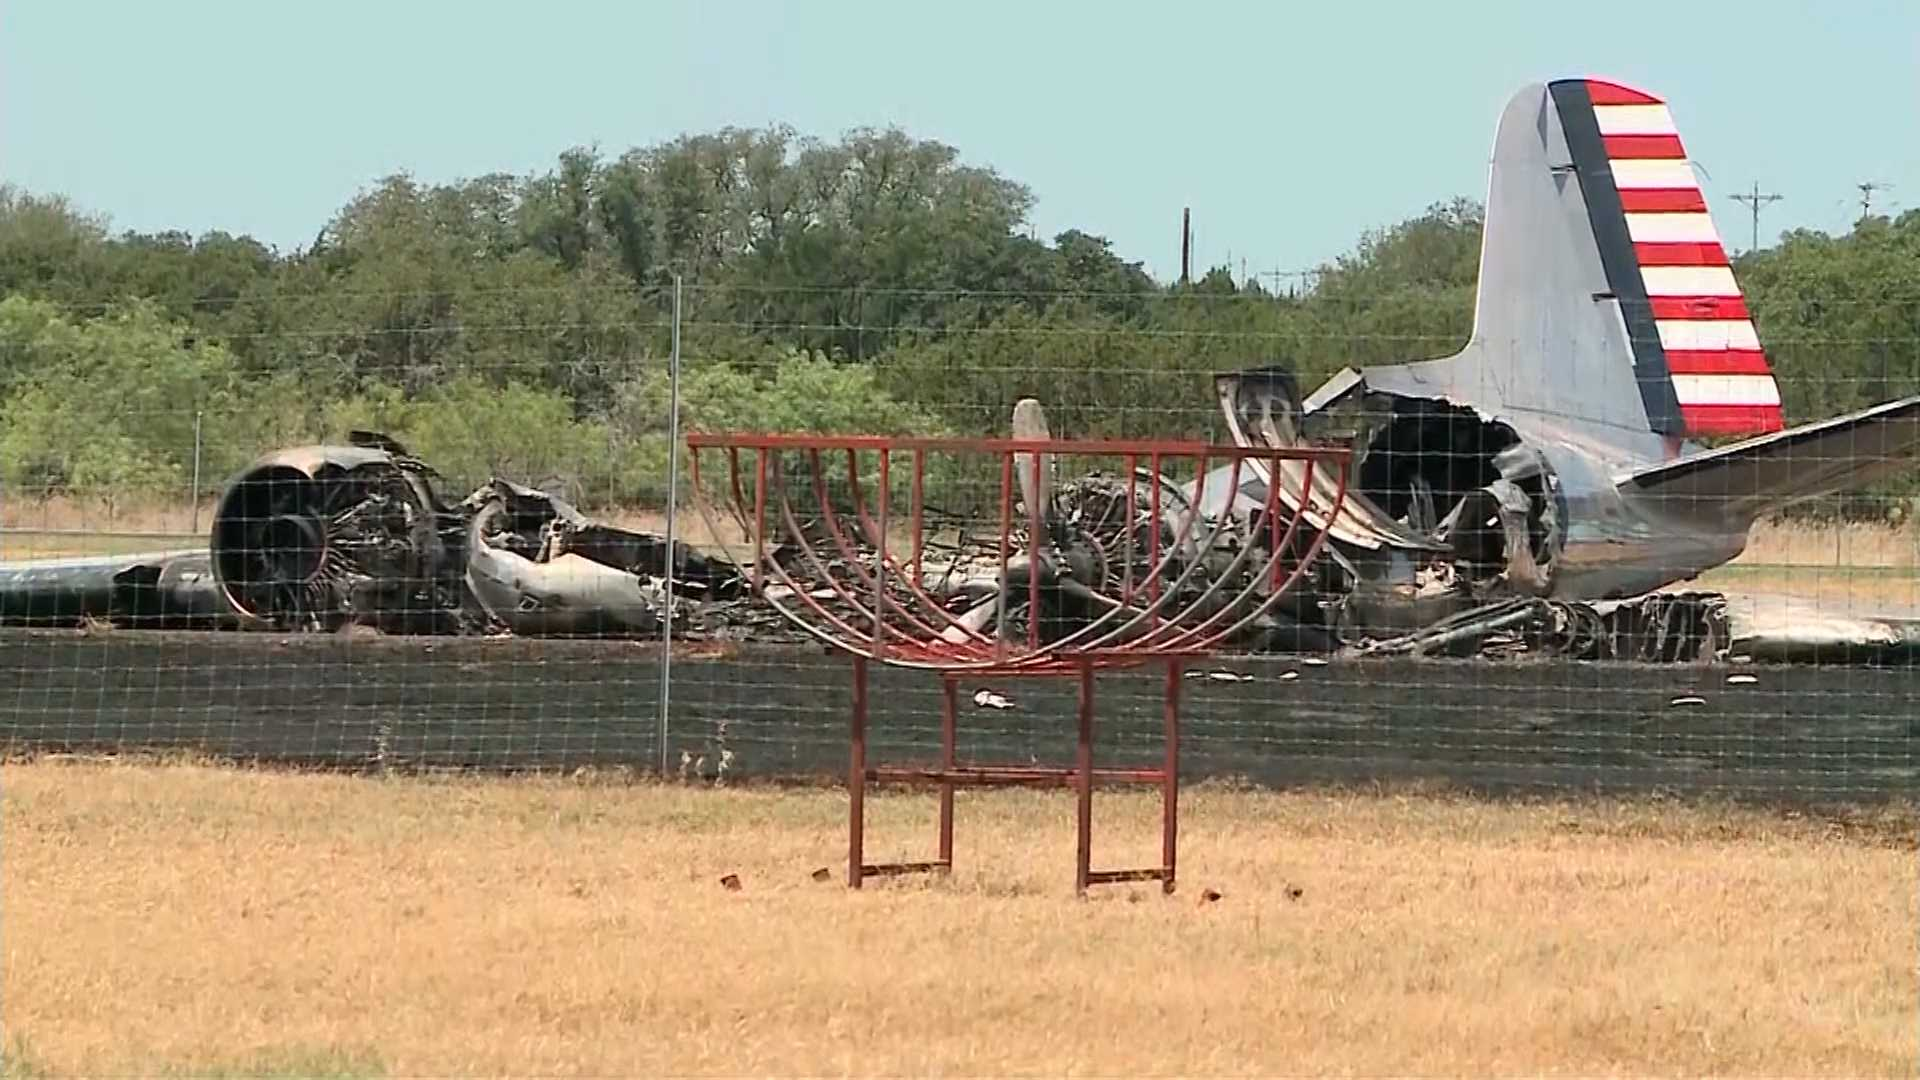 Video shows Texas plane, bound for Oshkosh, crashing after takeoff